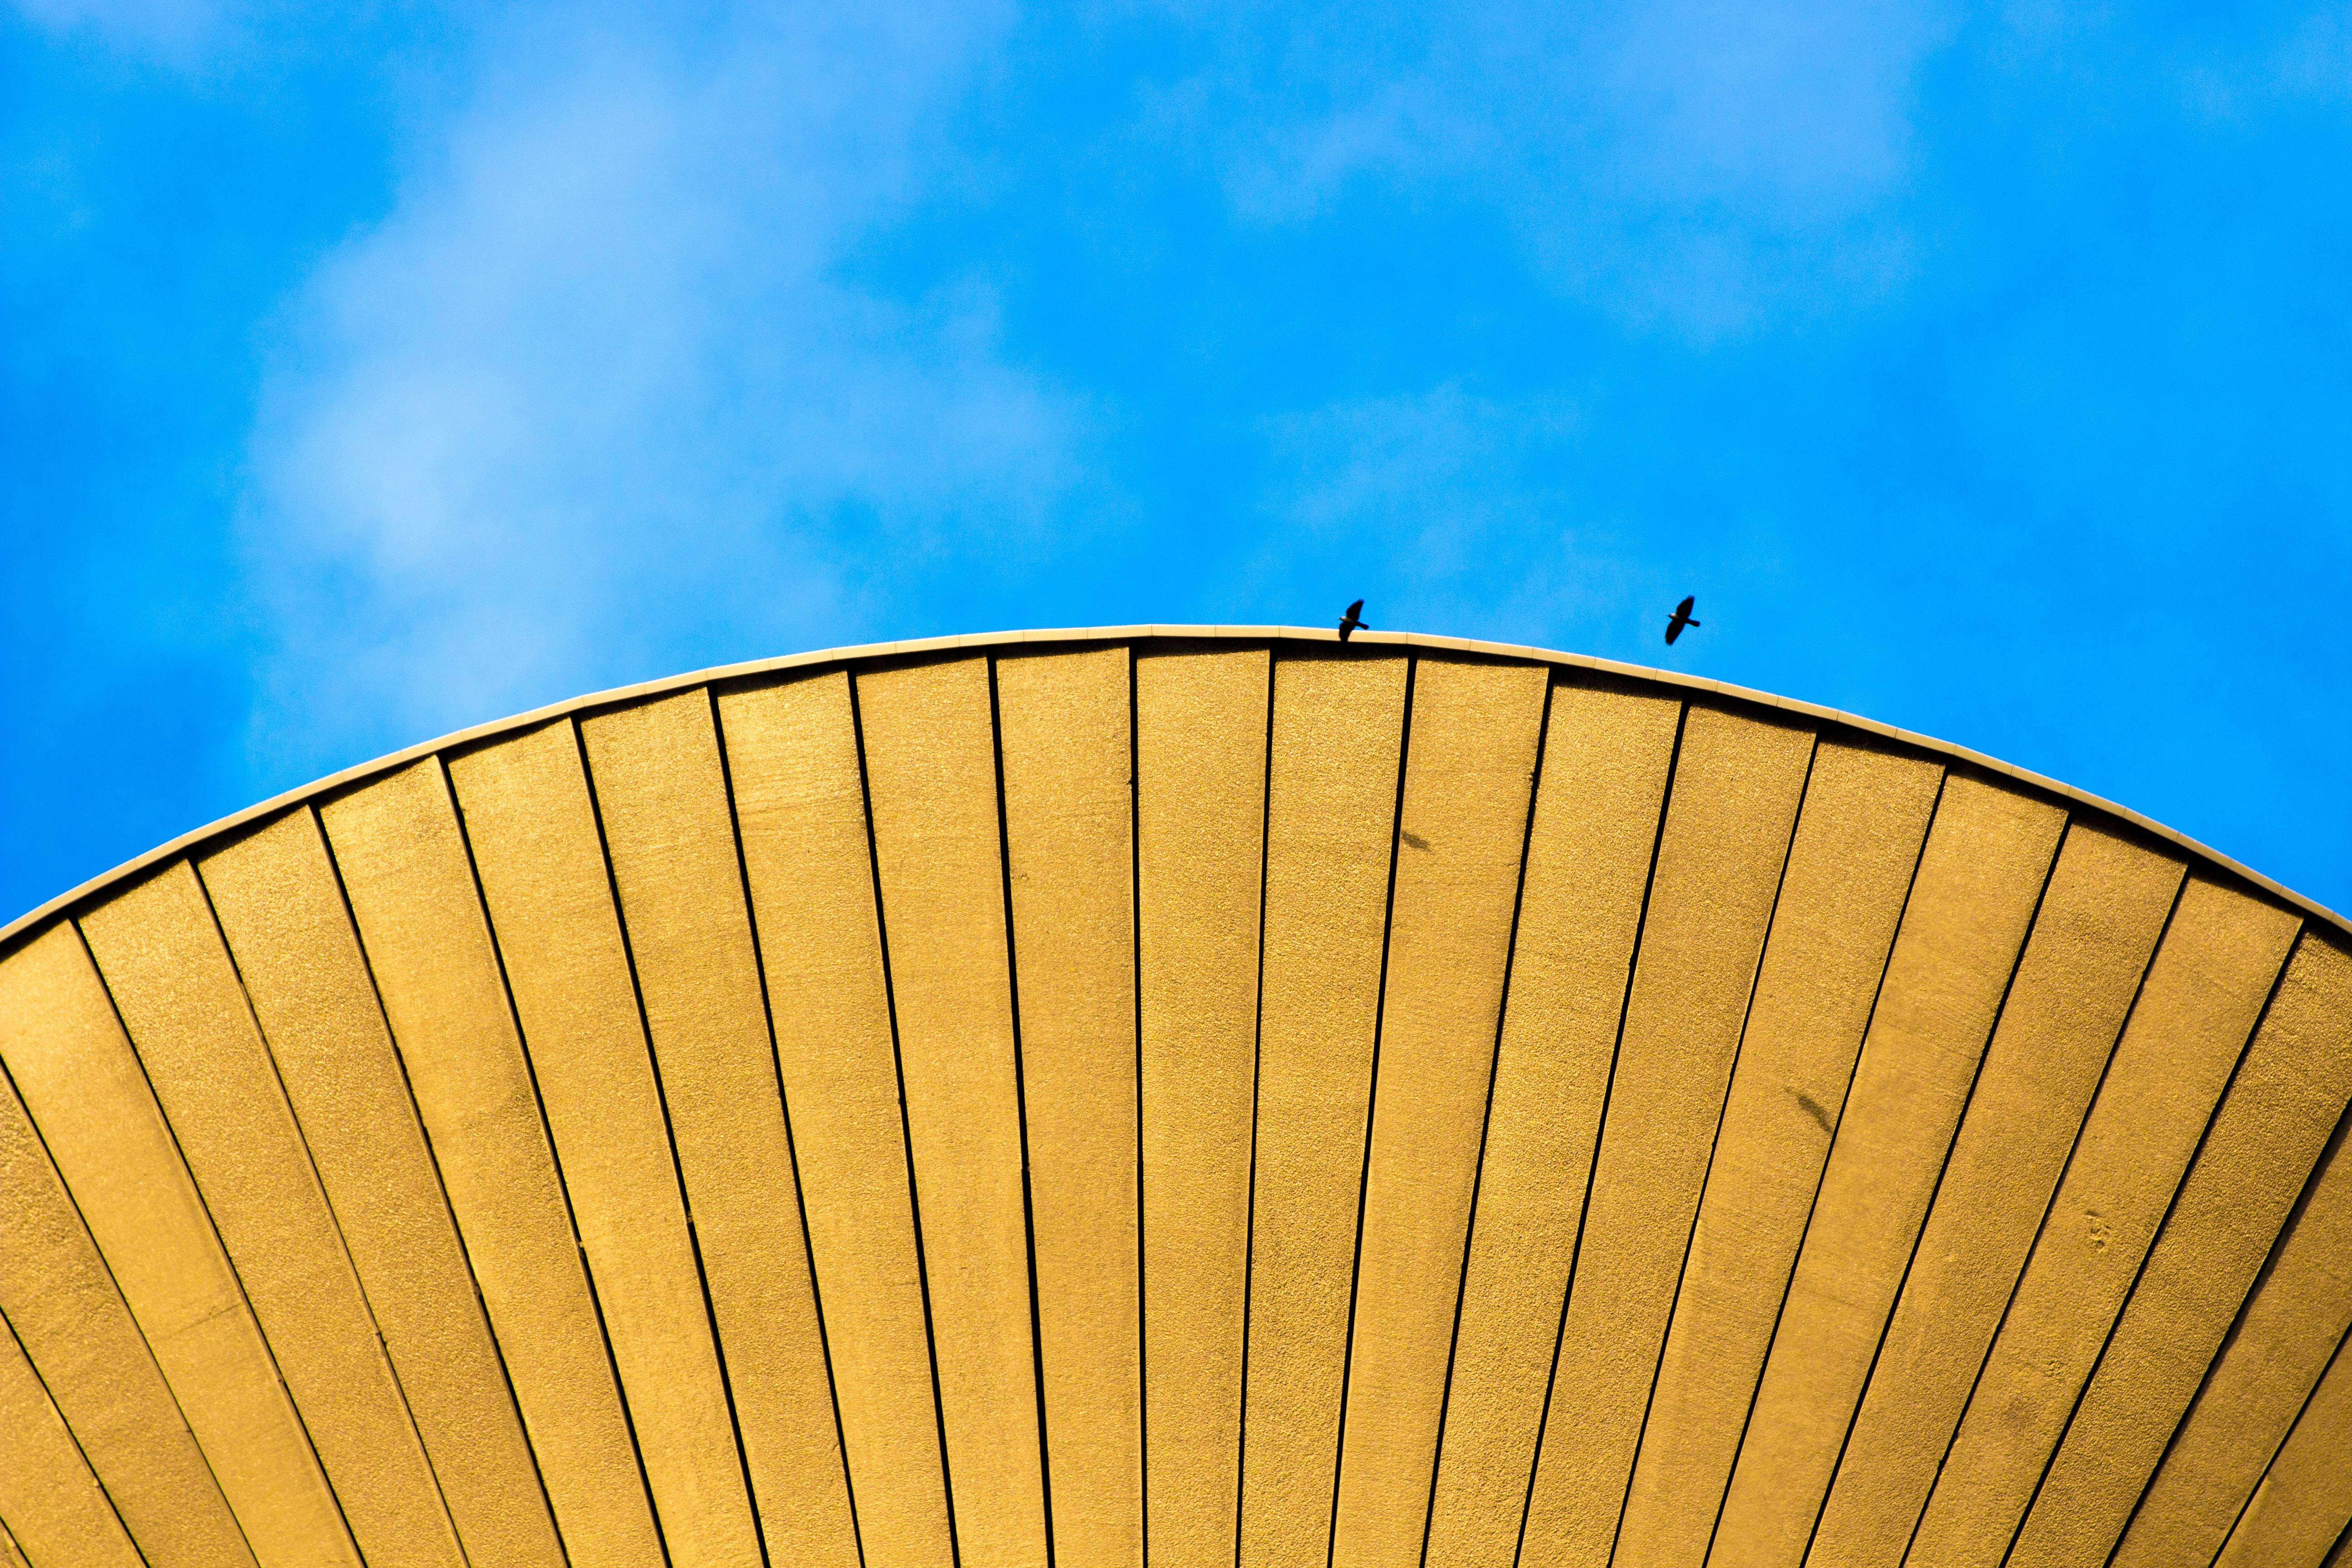 yellow oil umbrella under blue sky